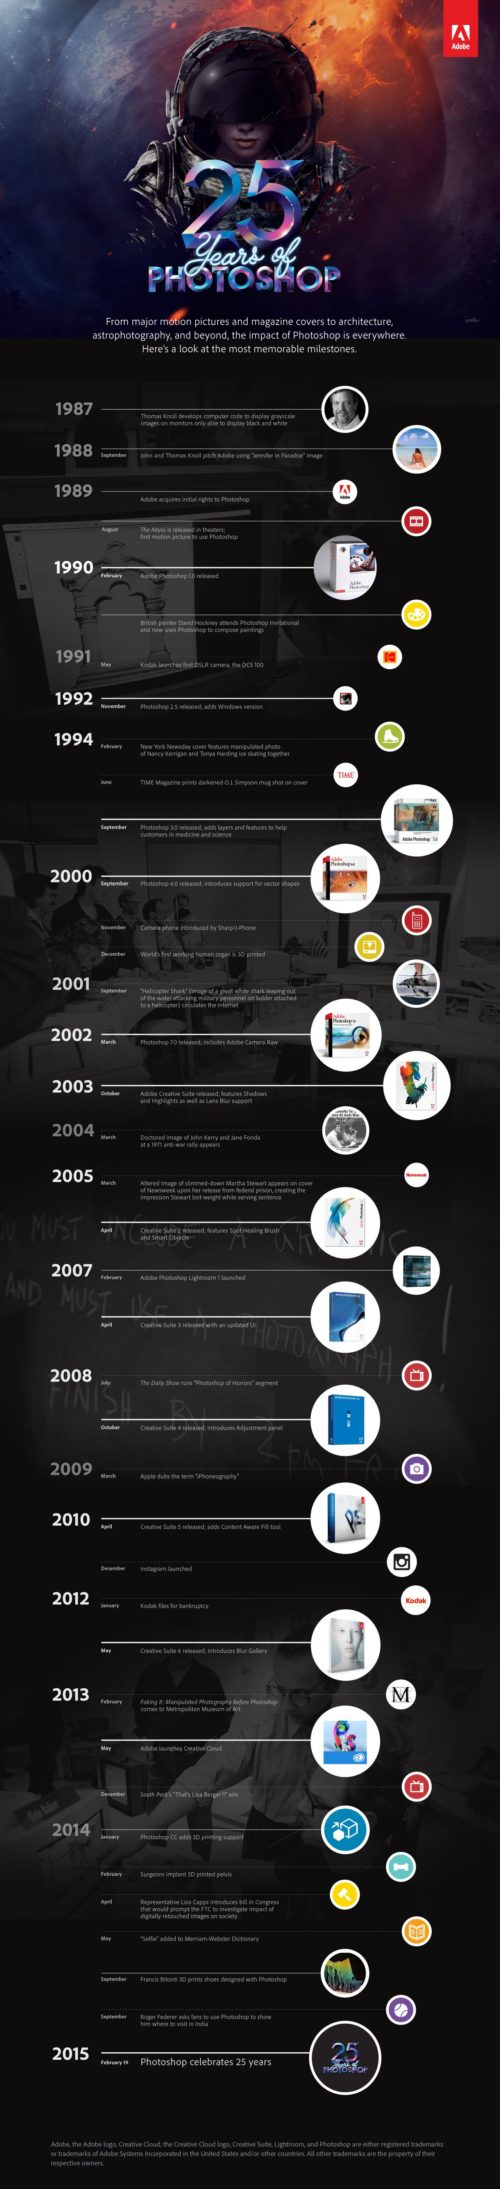 Photoshop-25th-Anniversary-Timeline